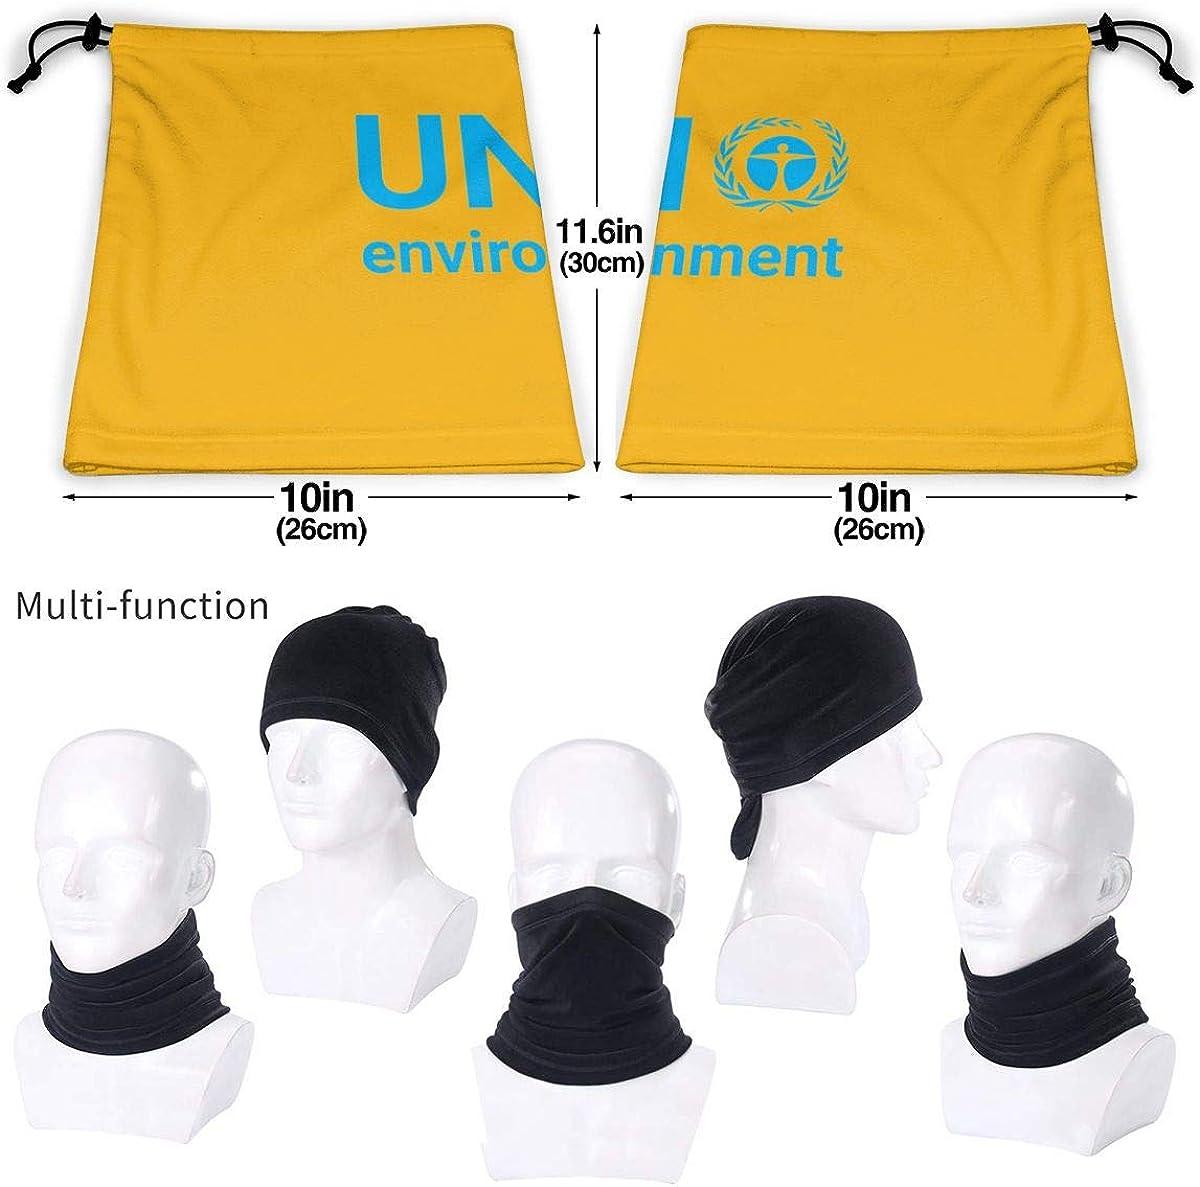 Wolrd Environment Day2 Black Multi-function Neck Warmer Gaiter Polyester Neck Warmer Windproof Winter Neck Gaiter Cold Weather Scarf For Men Women